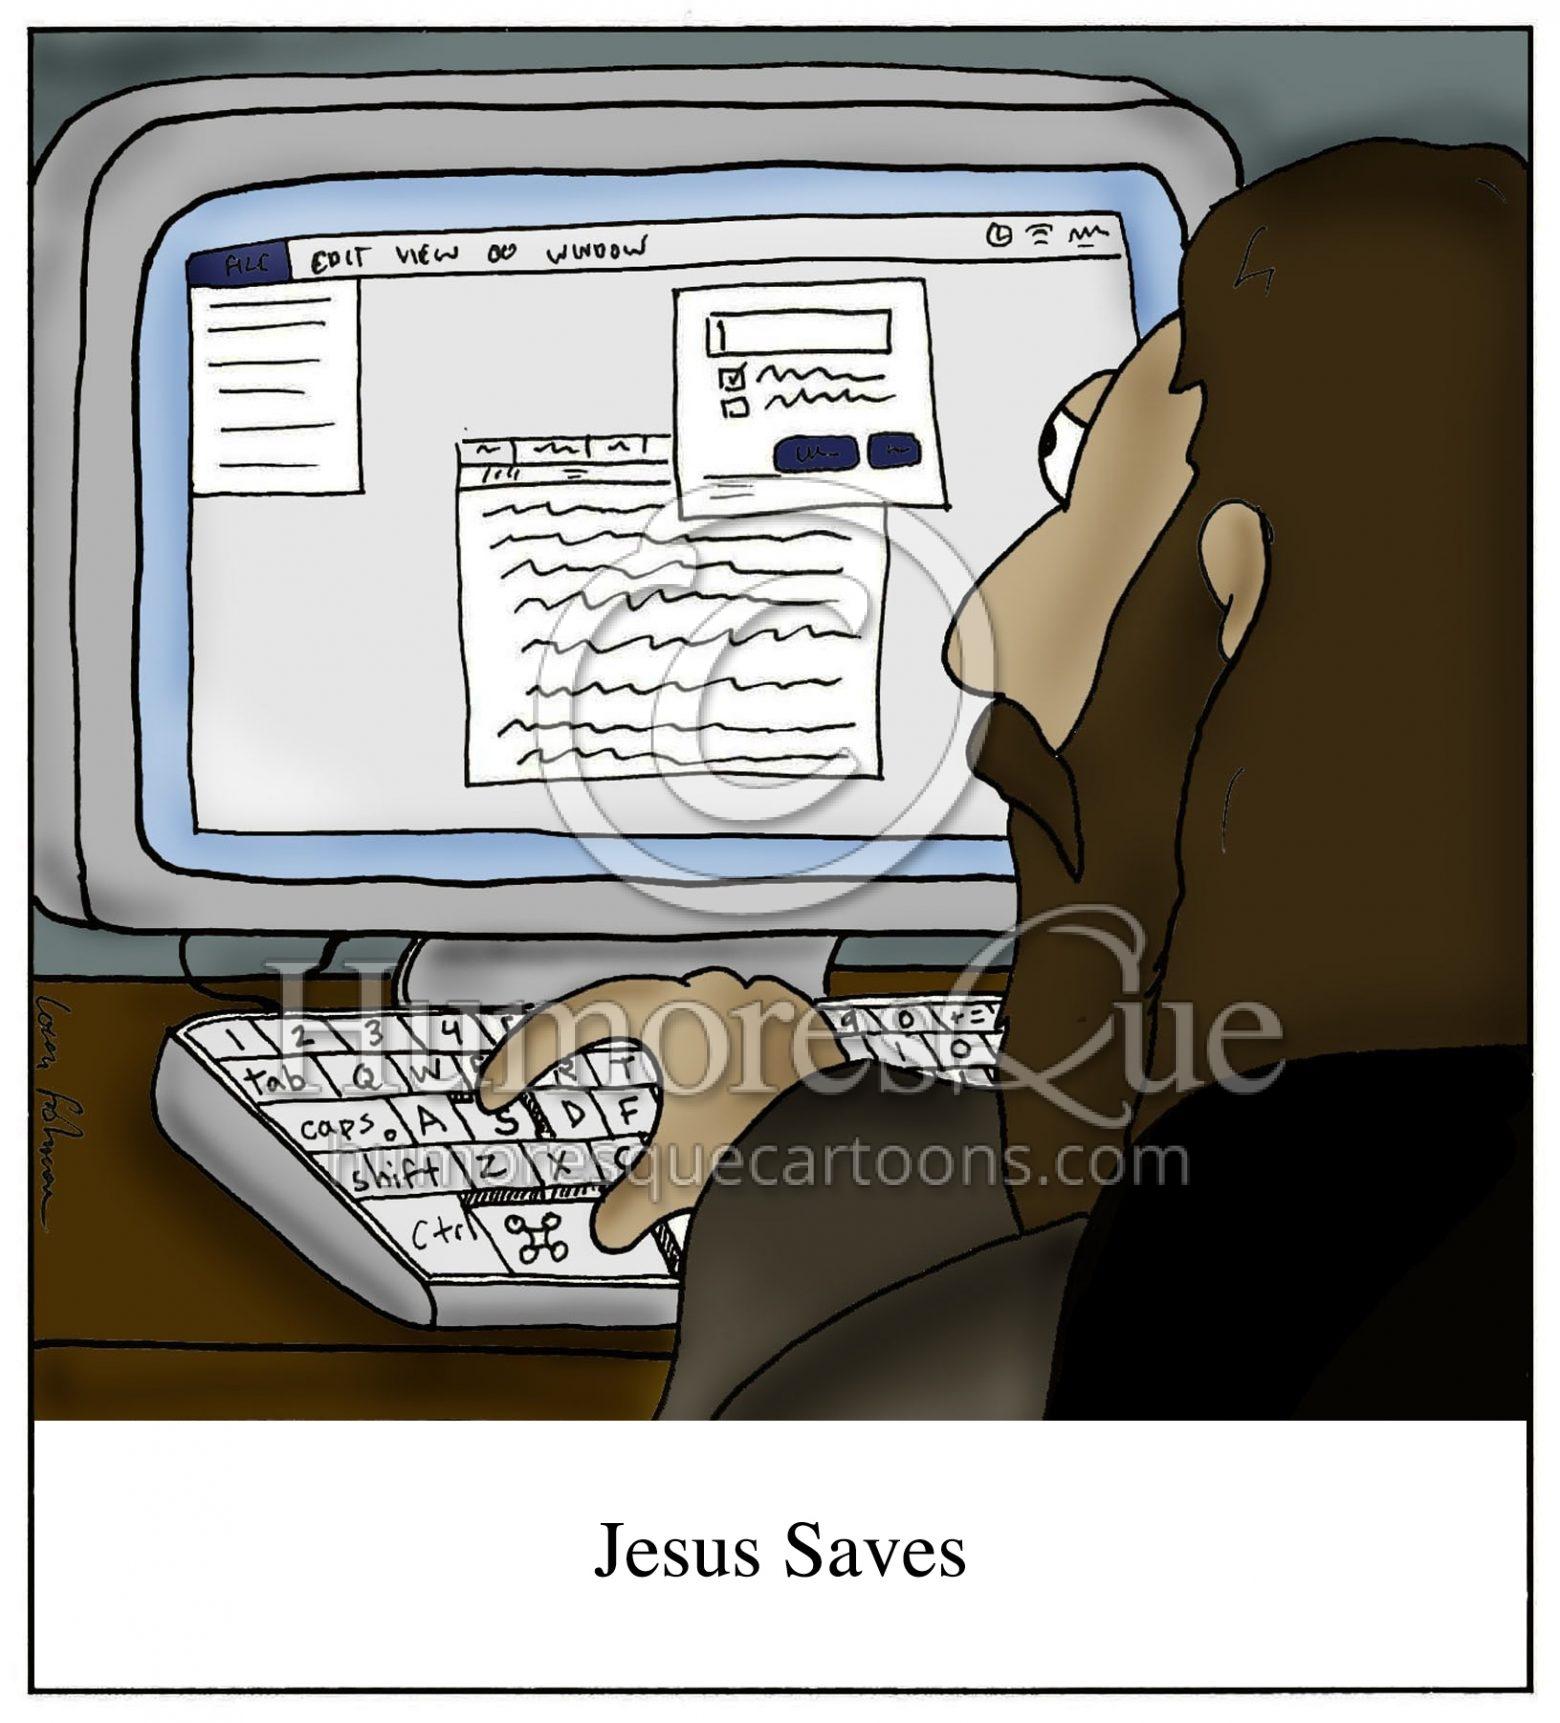 Jesus saves command s computer cartoon